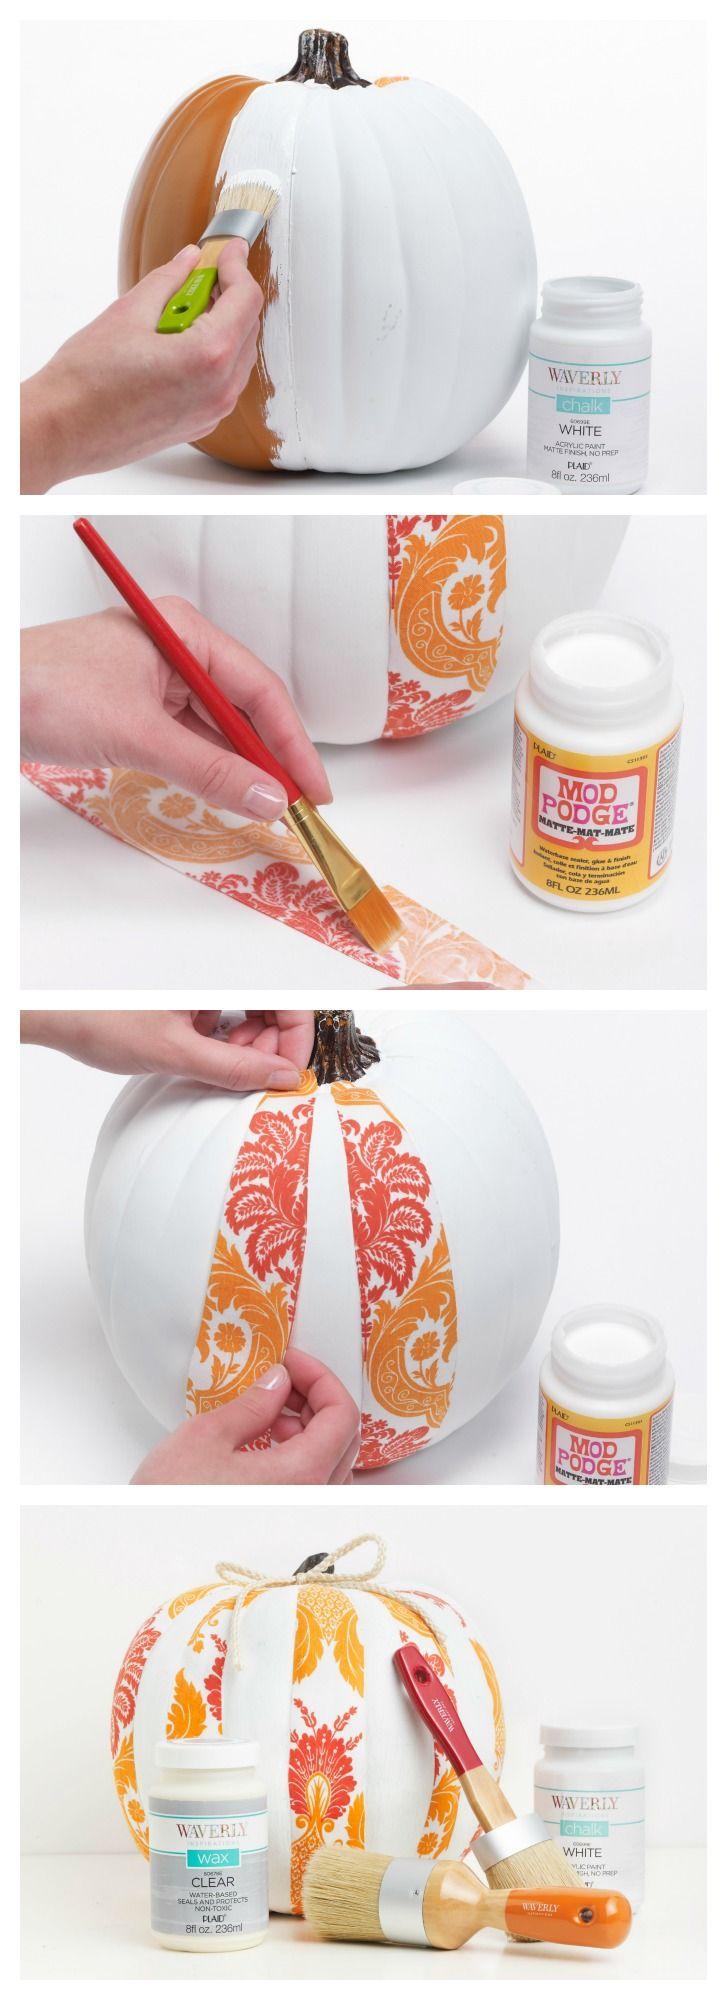 Diy Spray Paint Ideas 29 - 38+ Beautiful DIY Spray Paint Ideas